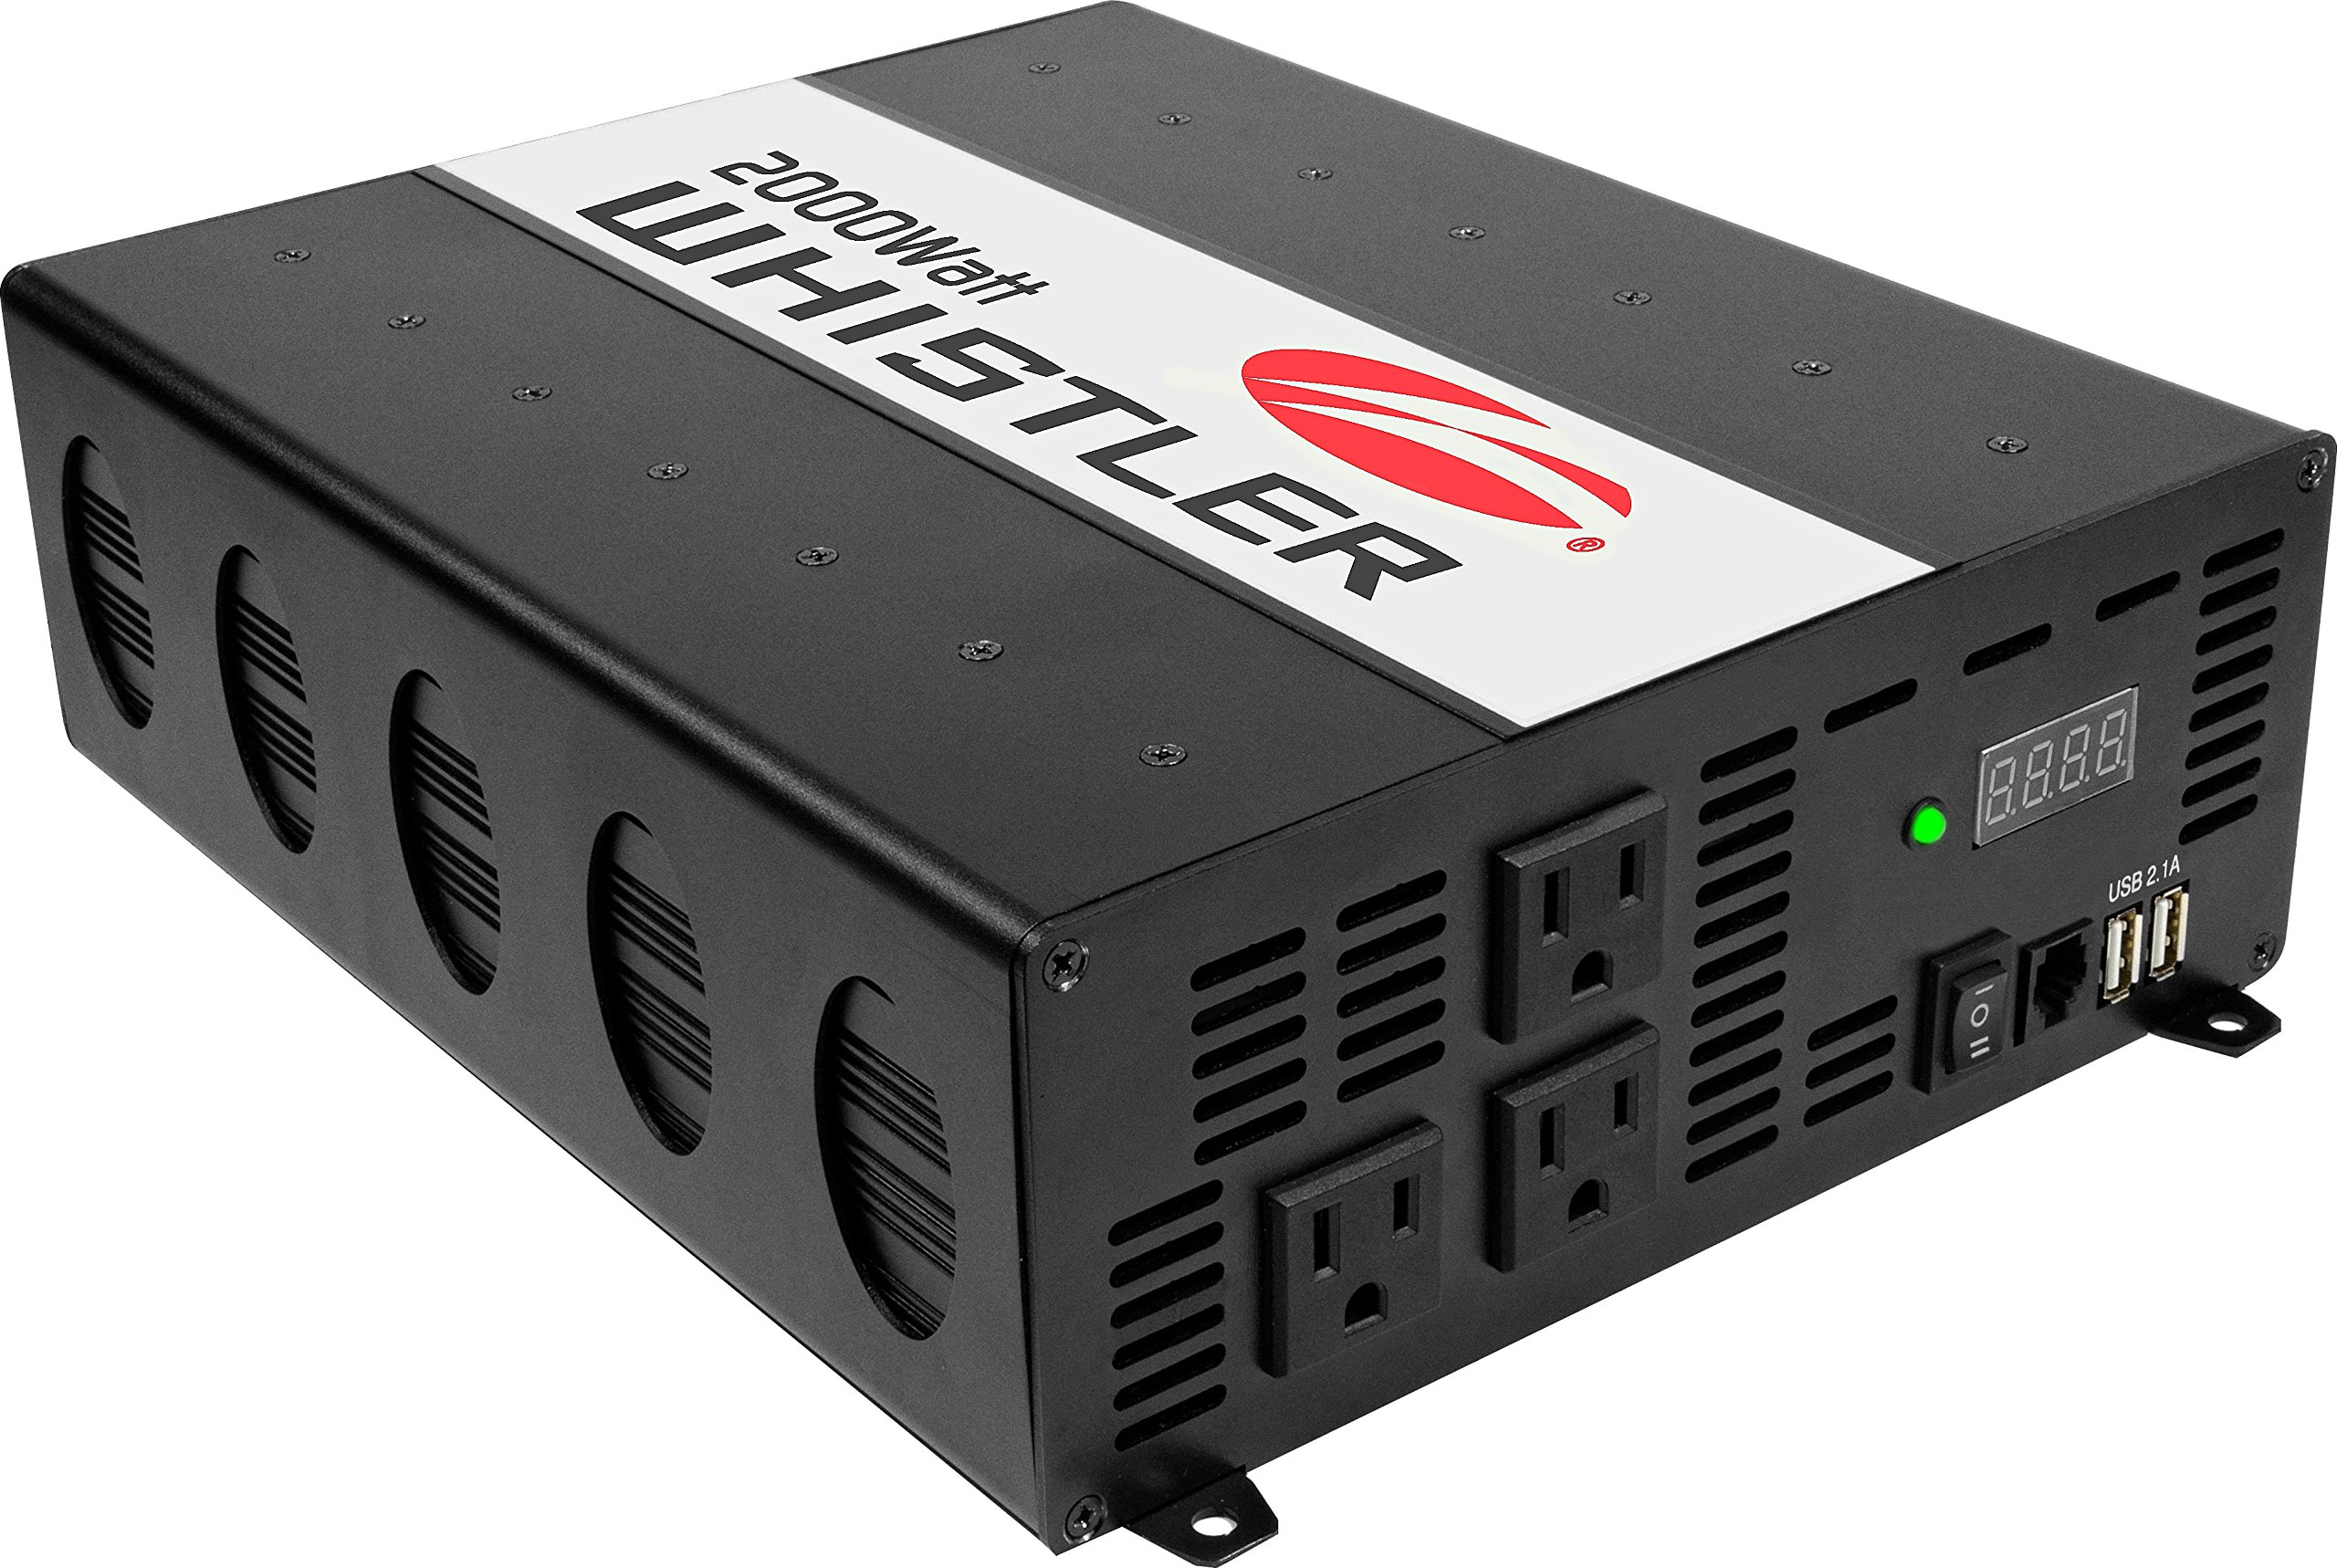 Whistler XP2000i Power Inverter: 2000 Watt Continuous / 4000 Watt Peak Power